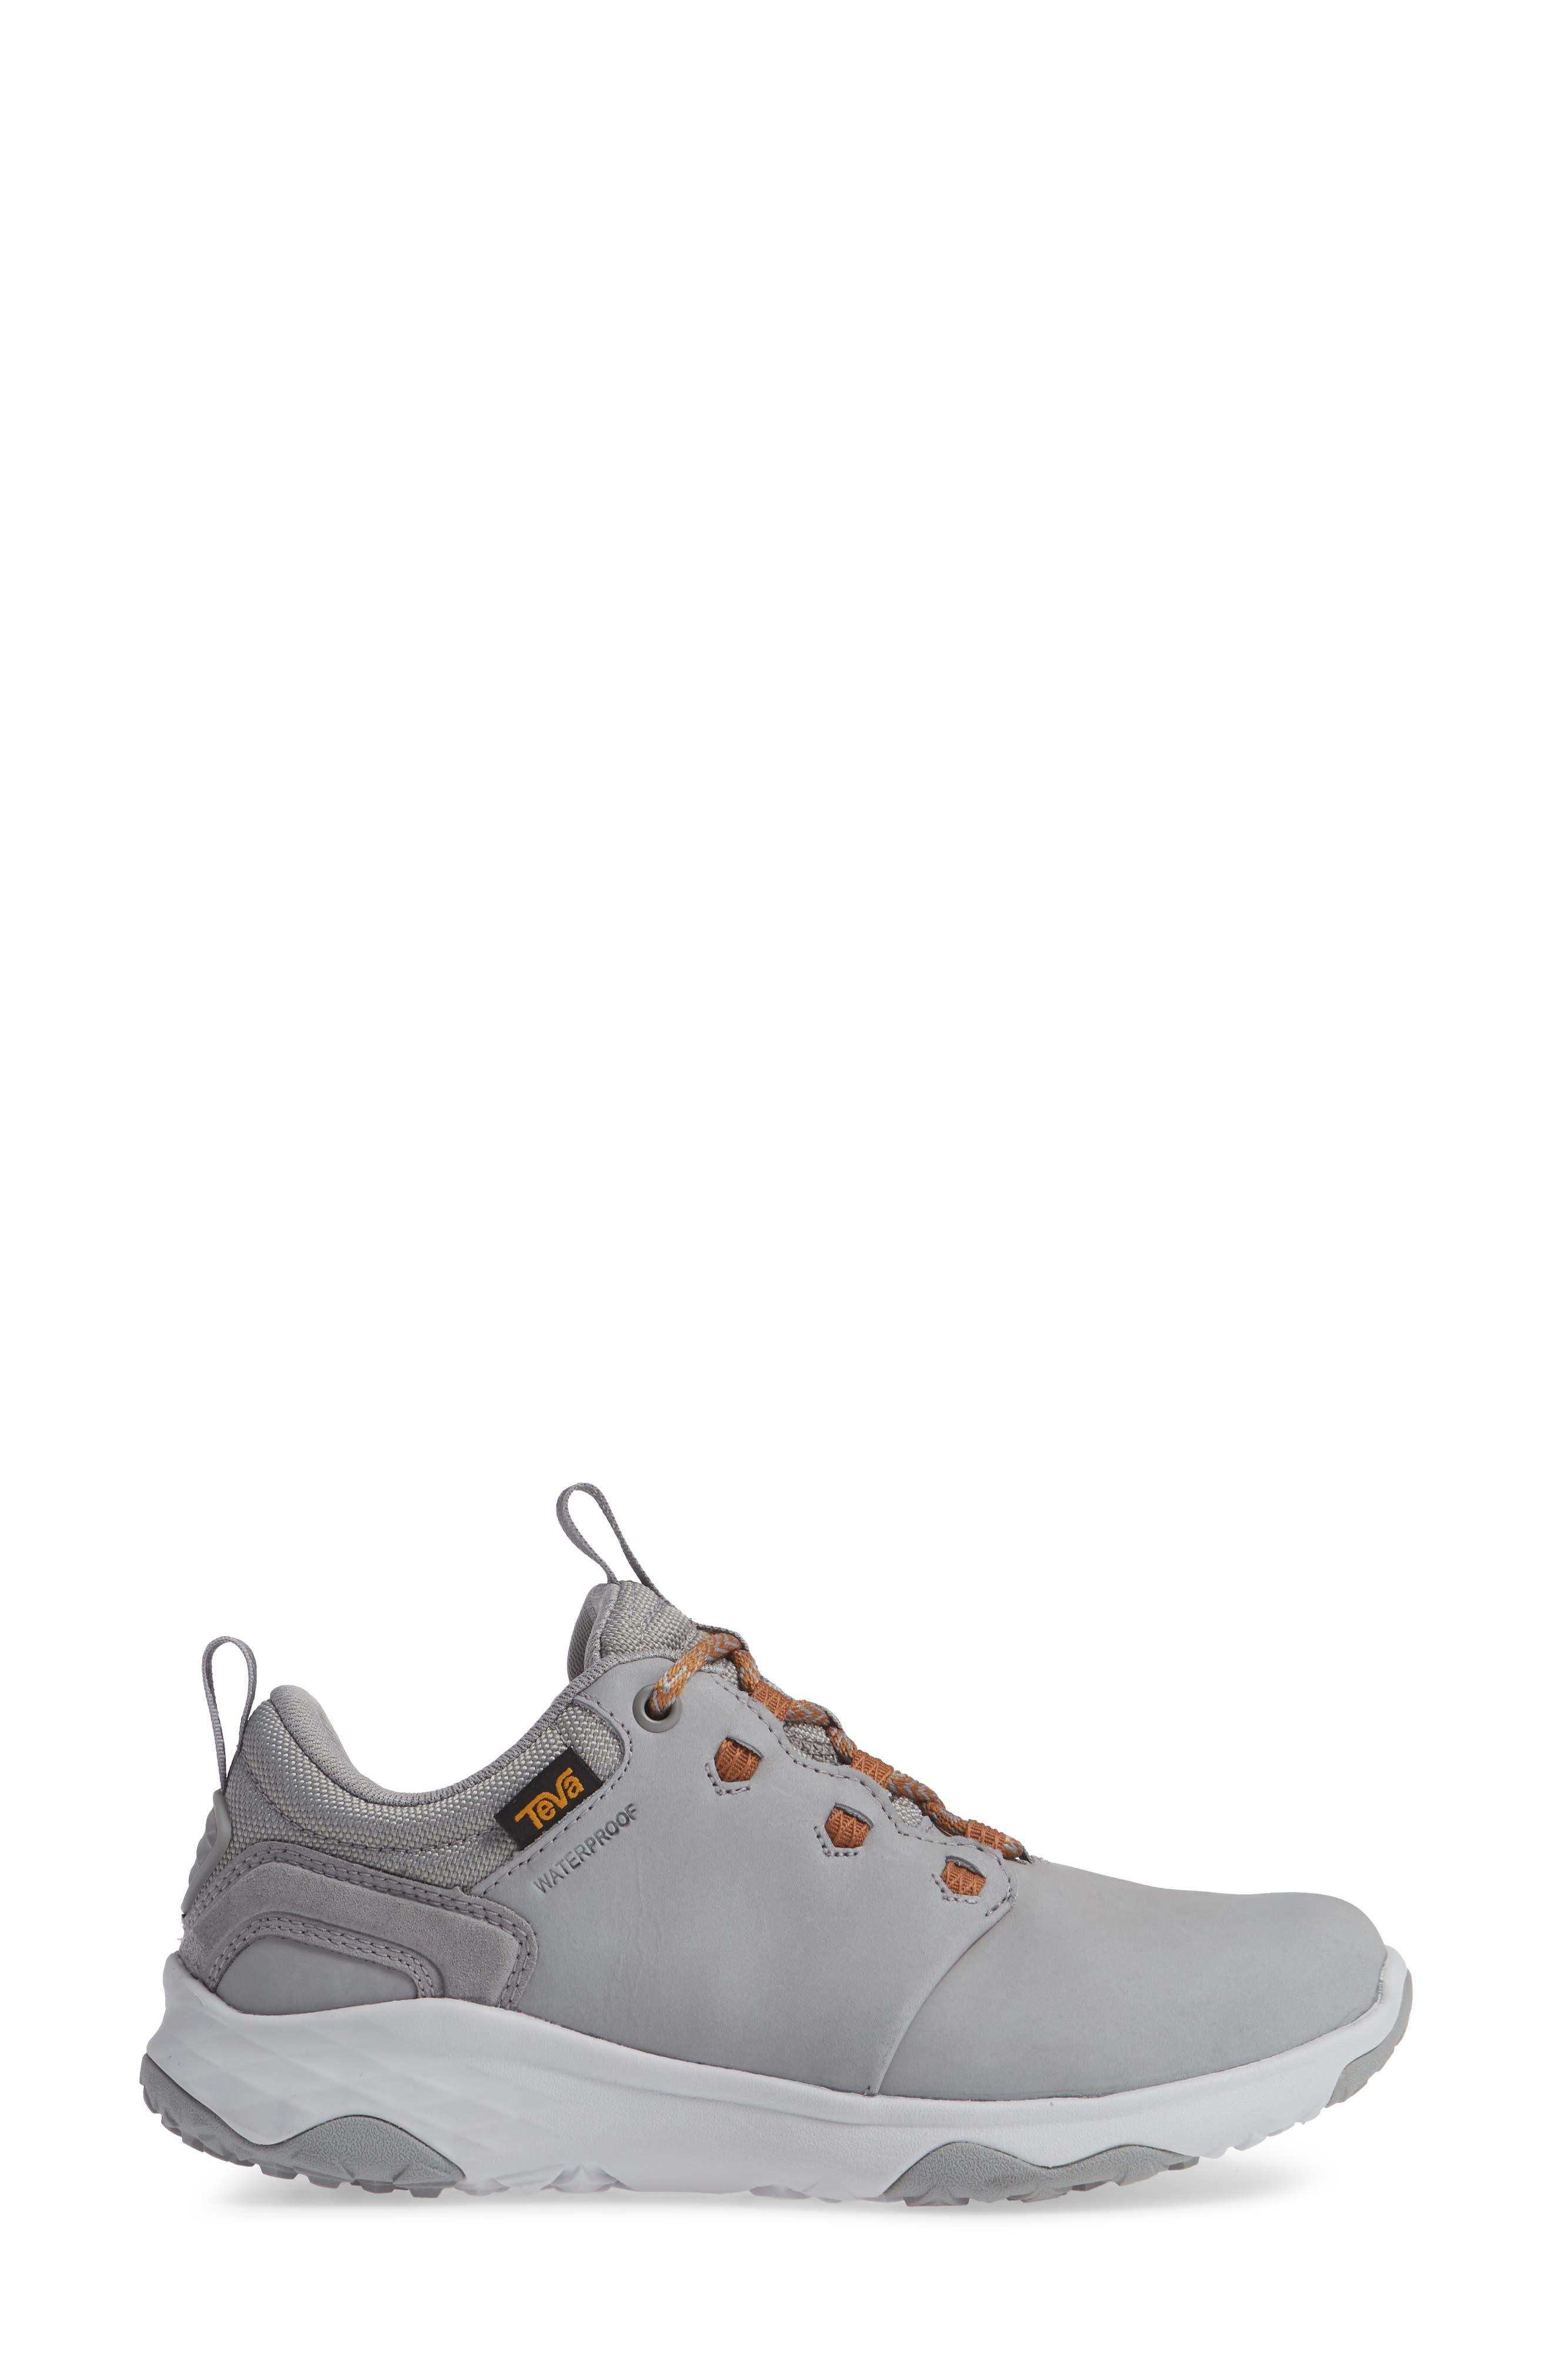 'Arrowood' Waterproof Sneaker,                             Alternate thumbnail 3, color,                             WILD DOVE LEATHER